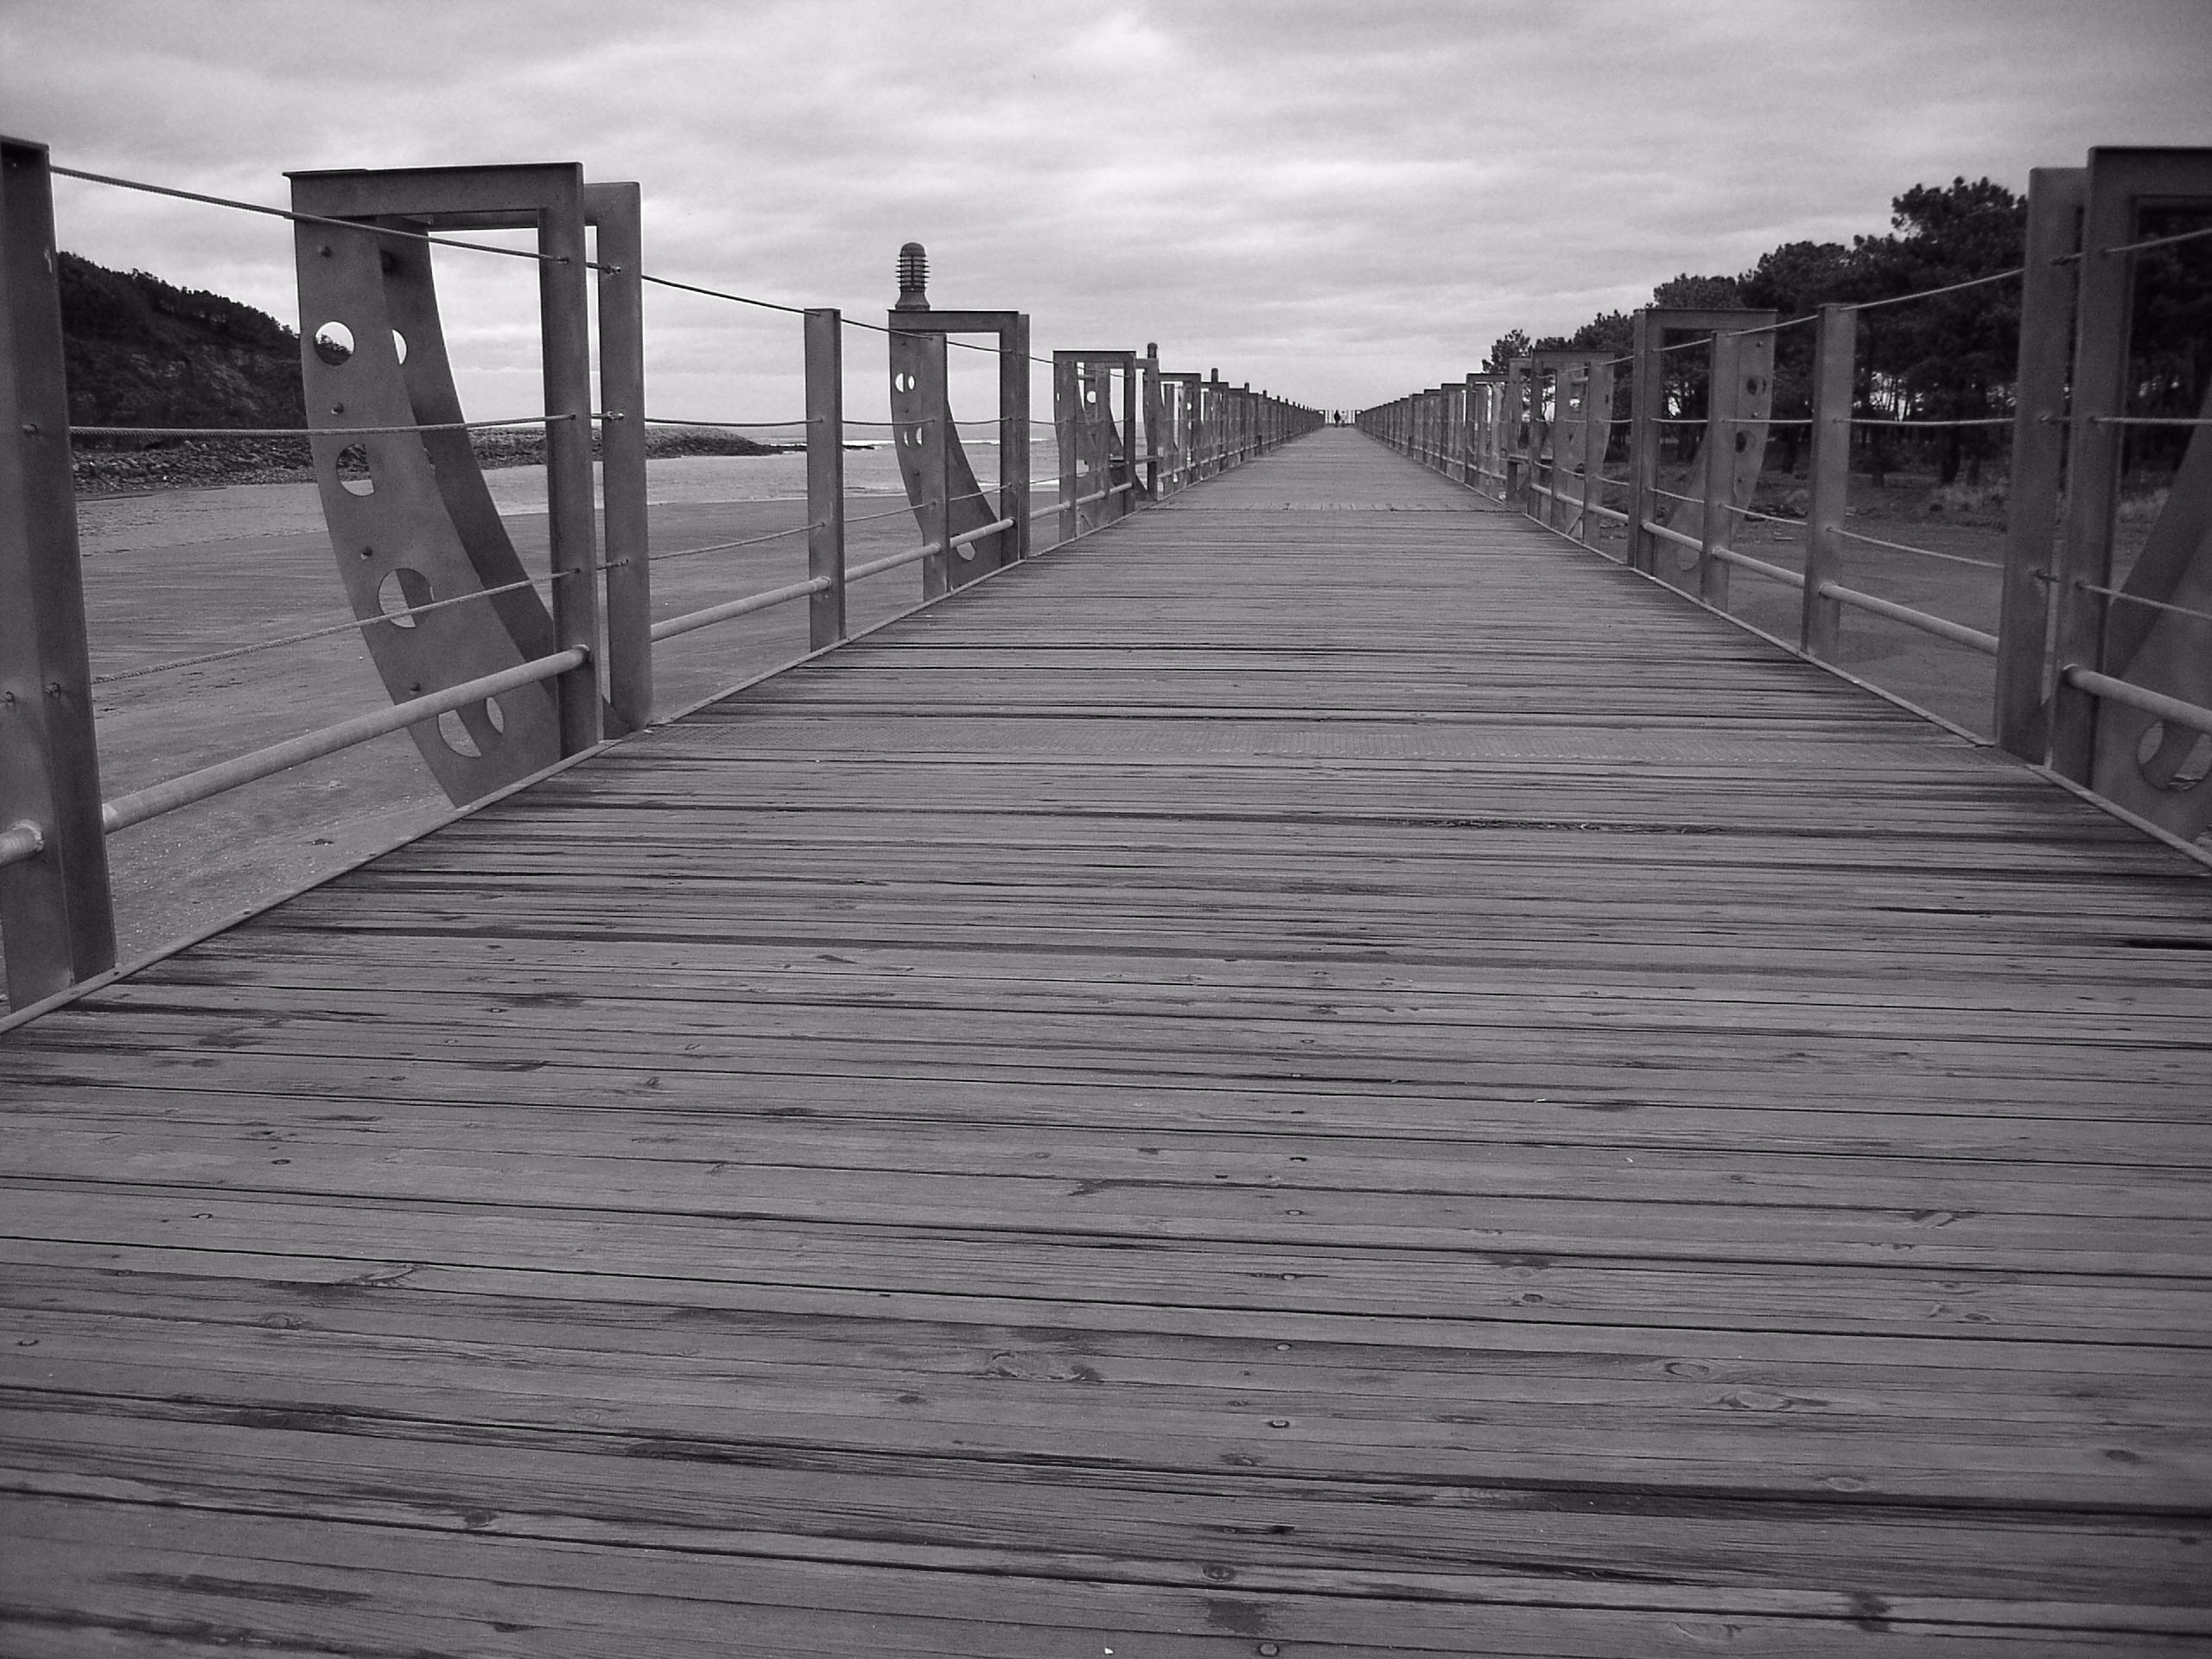 Walking beach - photography, blackwhite - ivop | ello